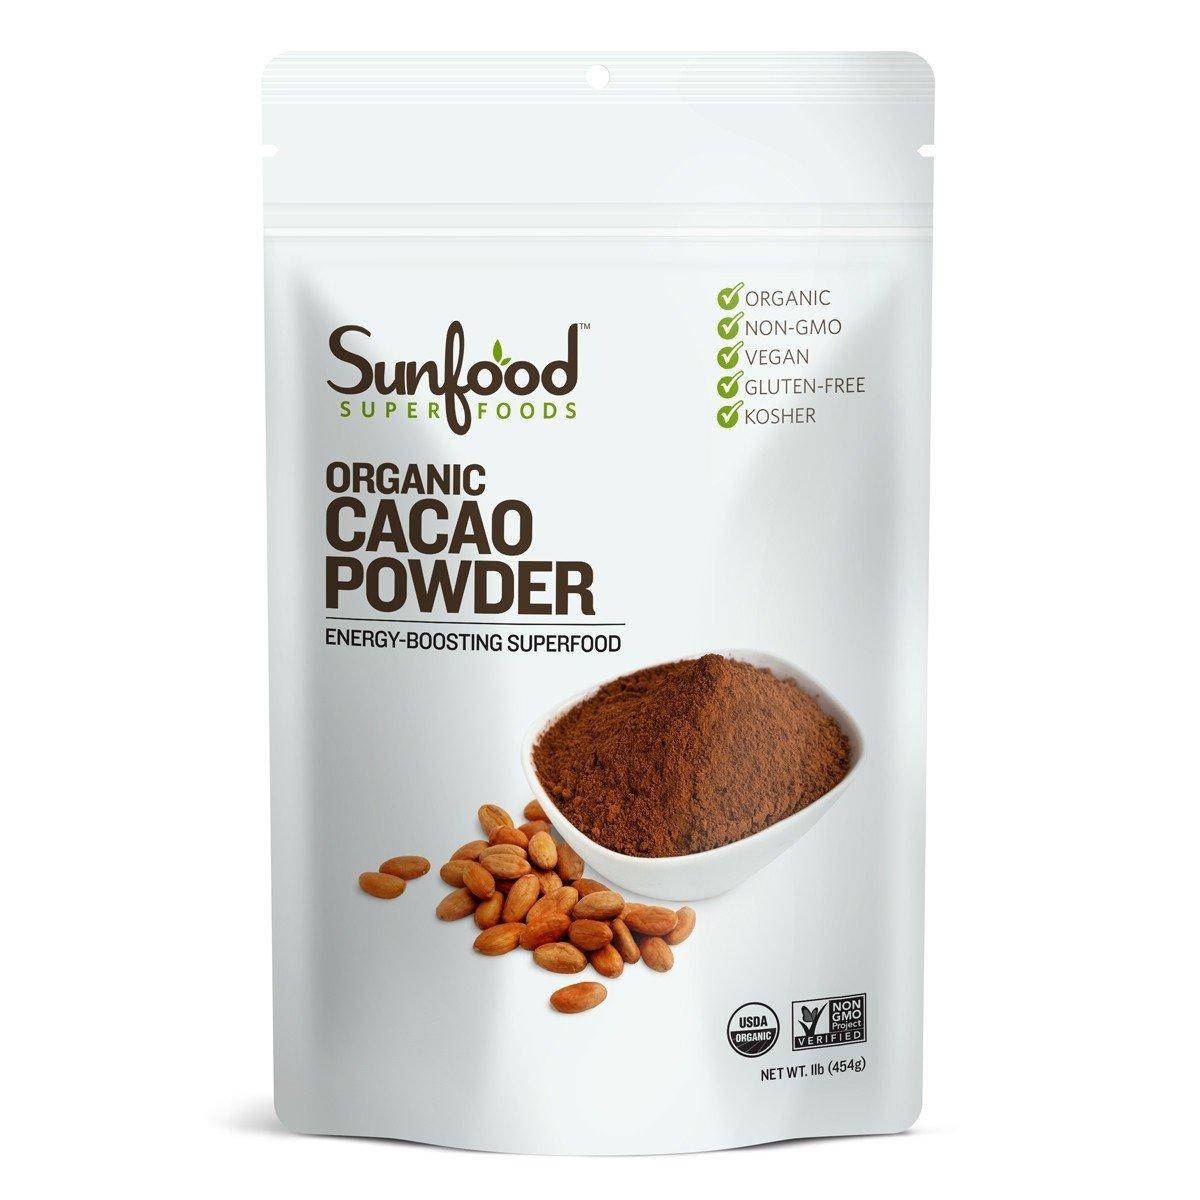 Sunfood Cacao Powder, 1lb, Organic